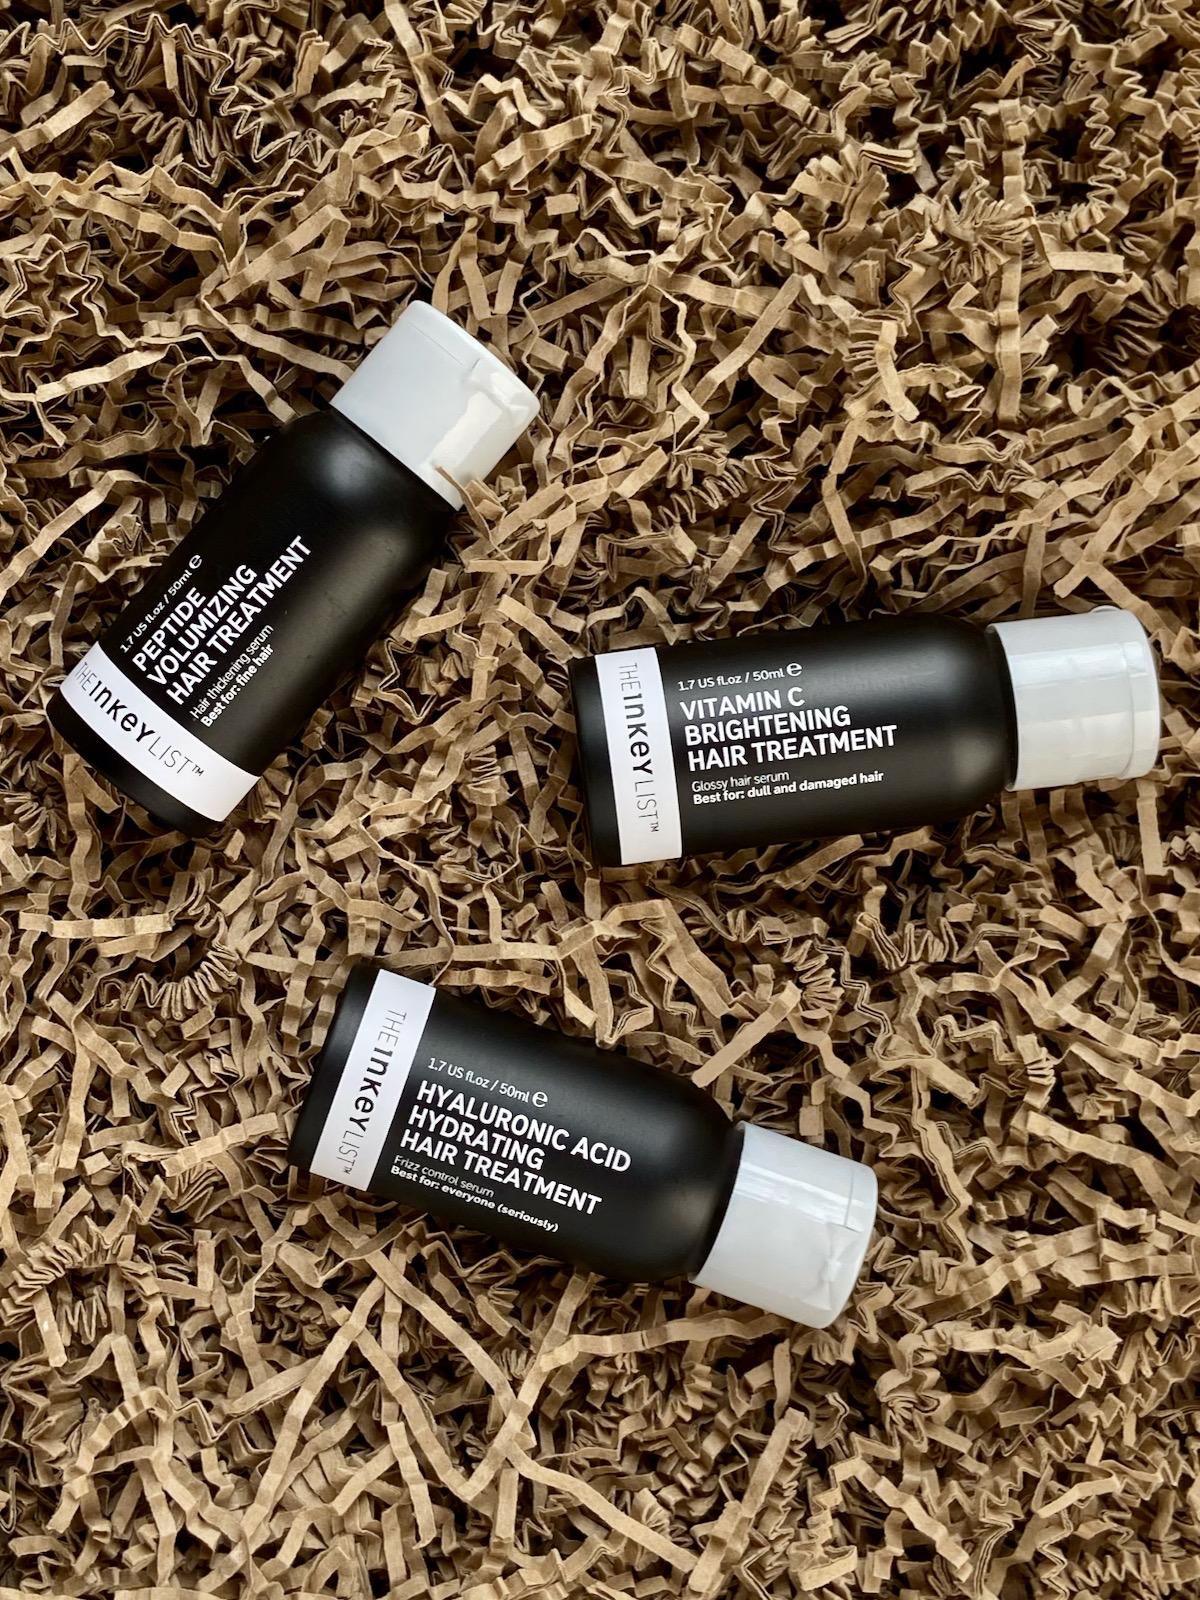 The Inkey List Peptide Volumizing Hair Treatment Vitamin C Brightening Hair Treatment Hyaluronic Acid Hydrating Hair Treatment Haarpflege